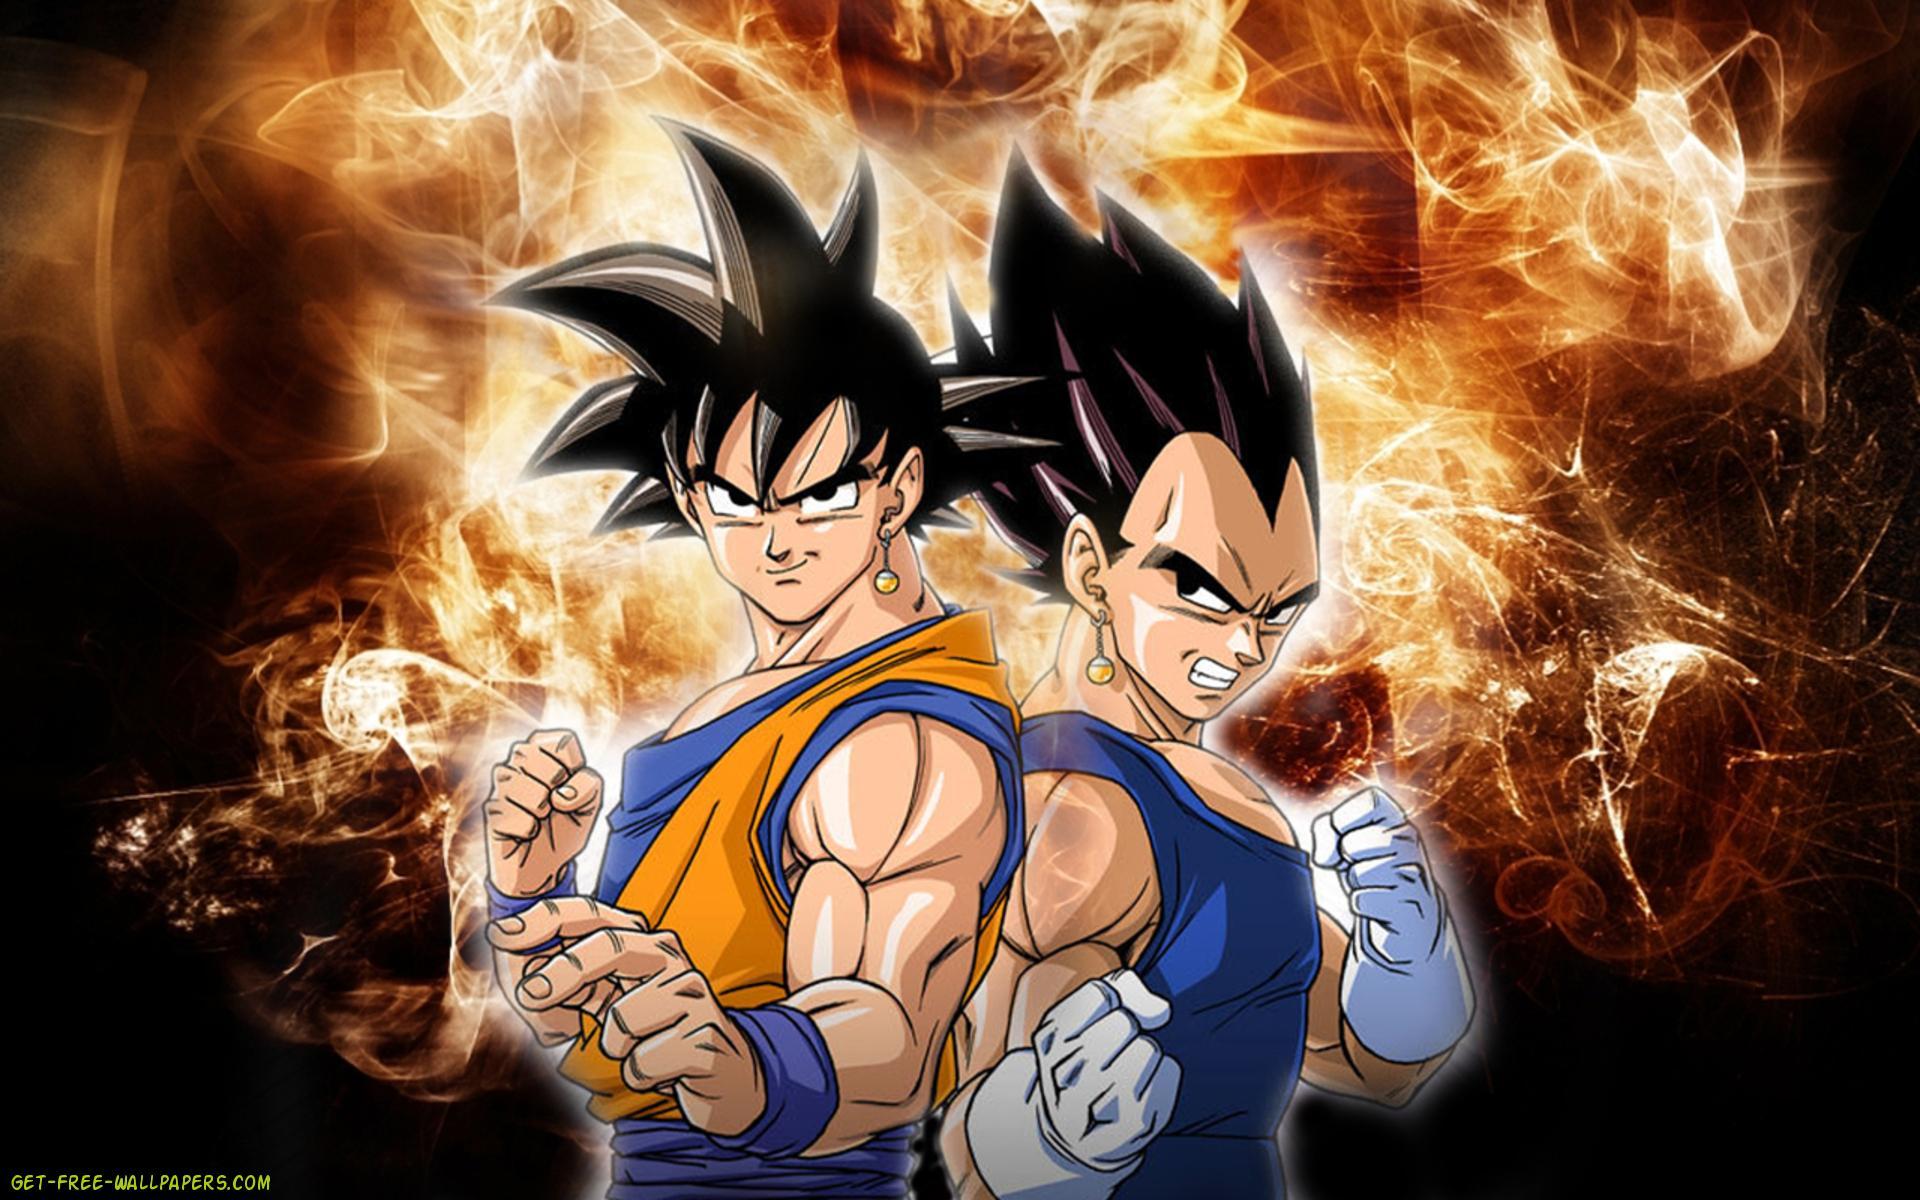 Dragon Ball Z Goku vs Vegeta Wallpaper Details and Download Free